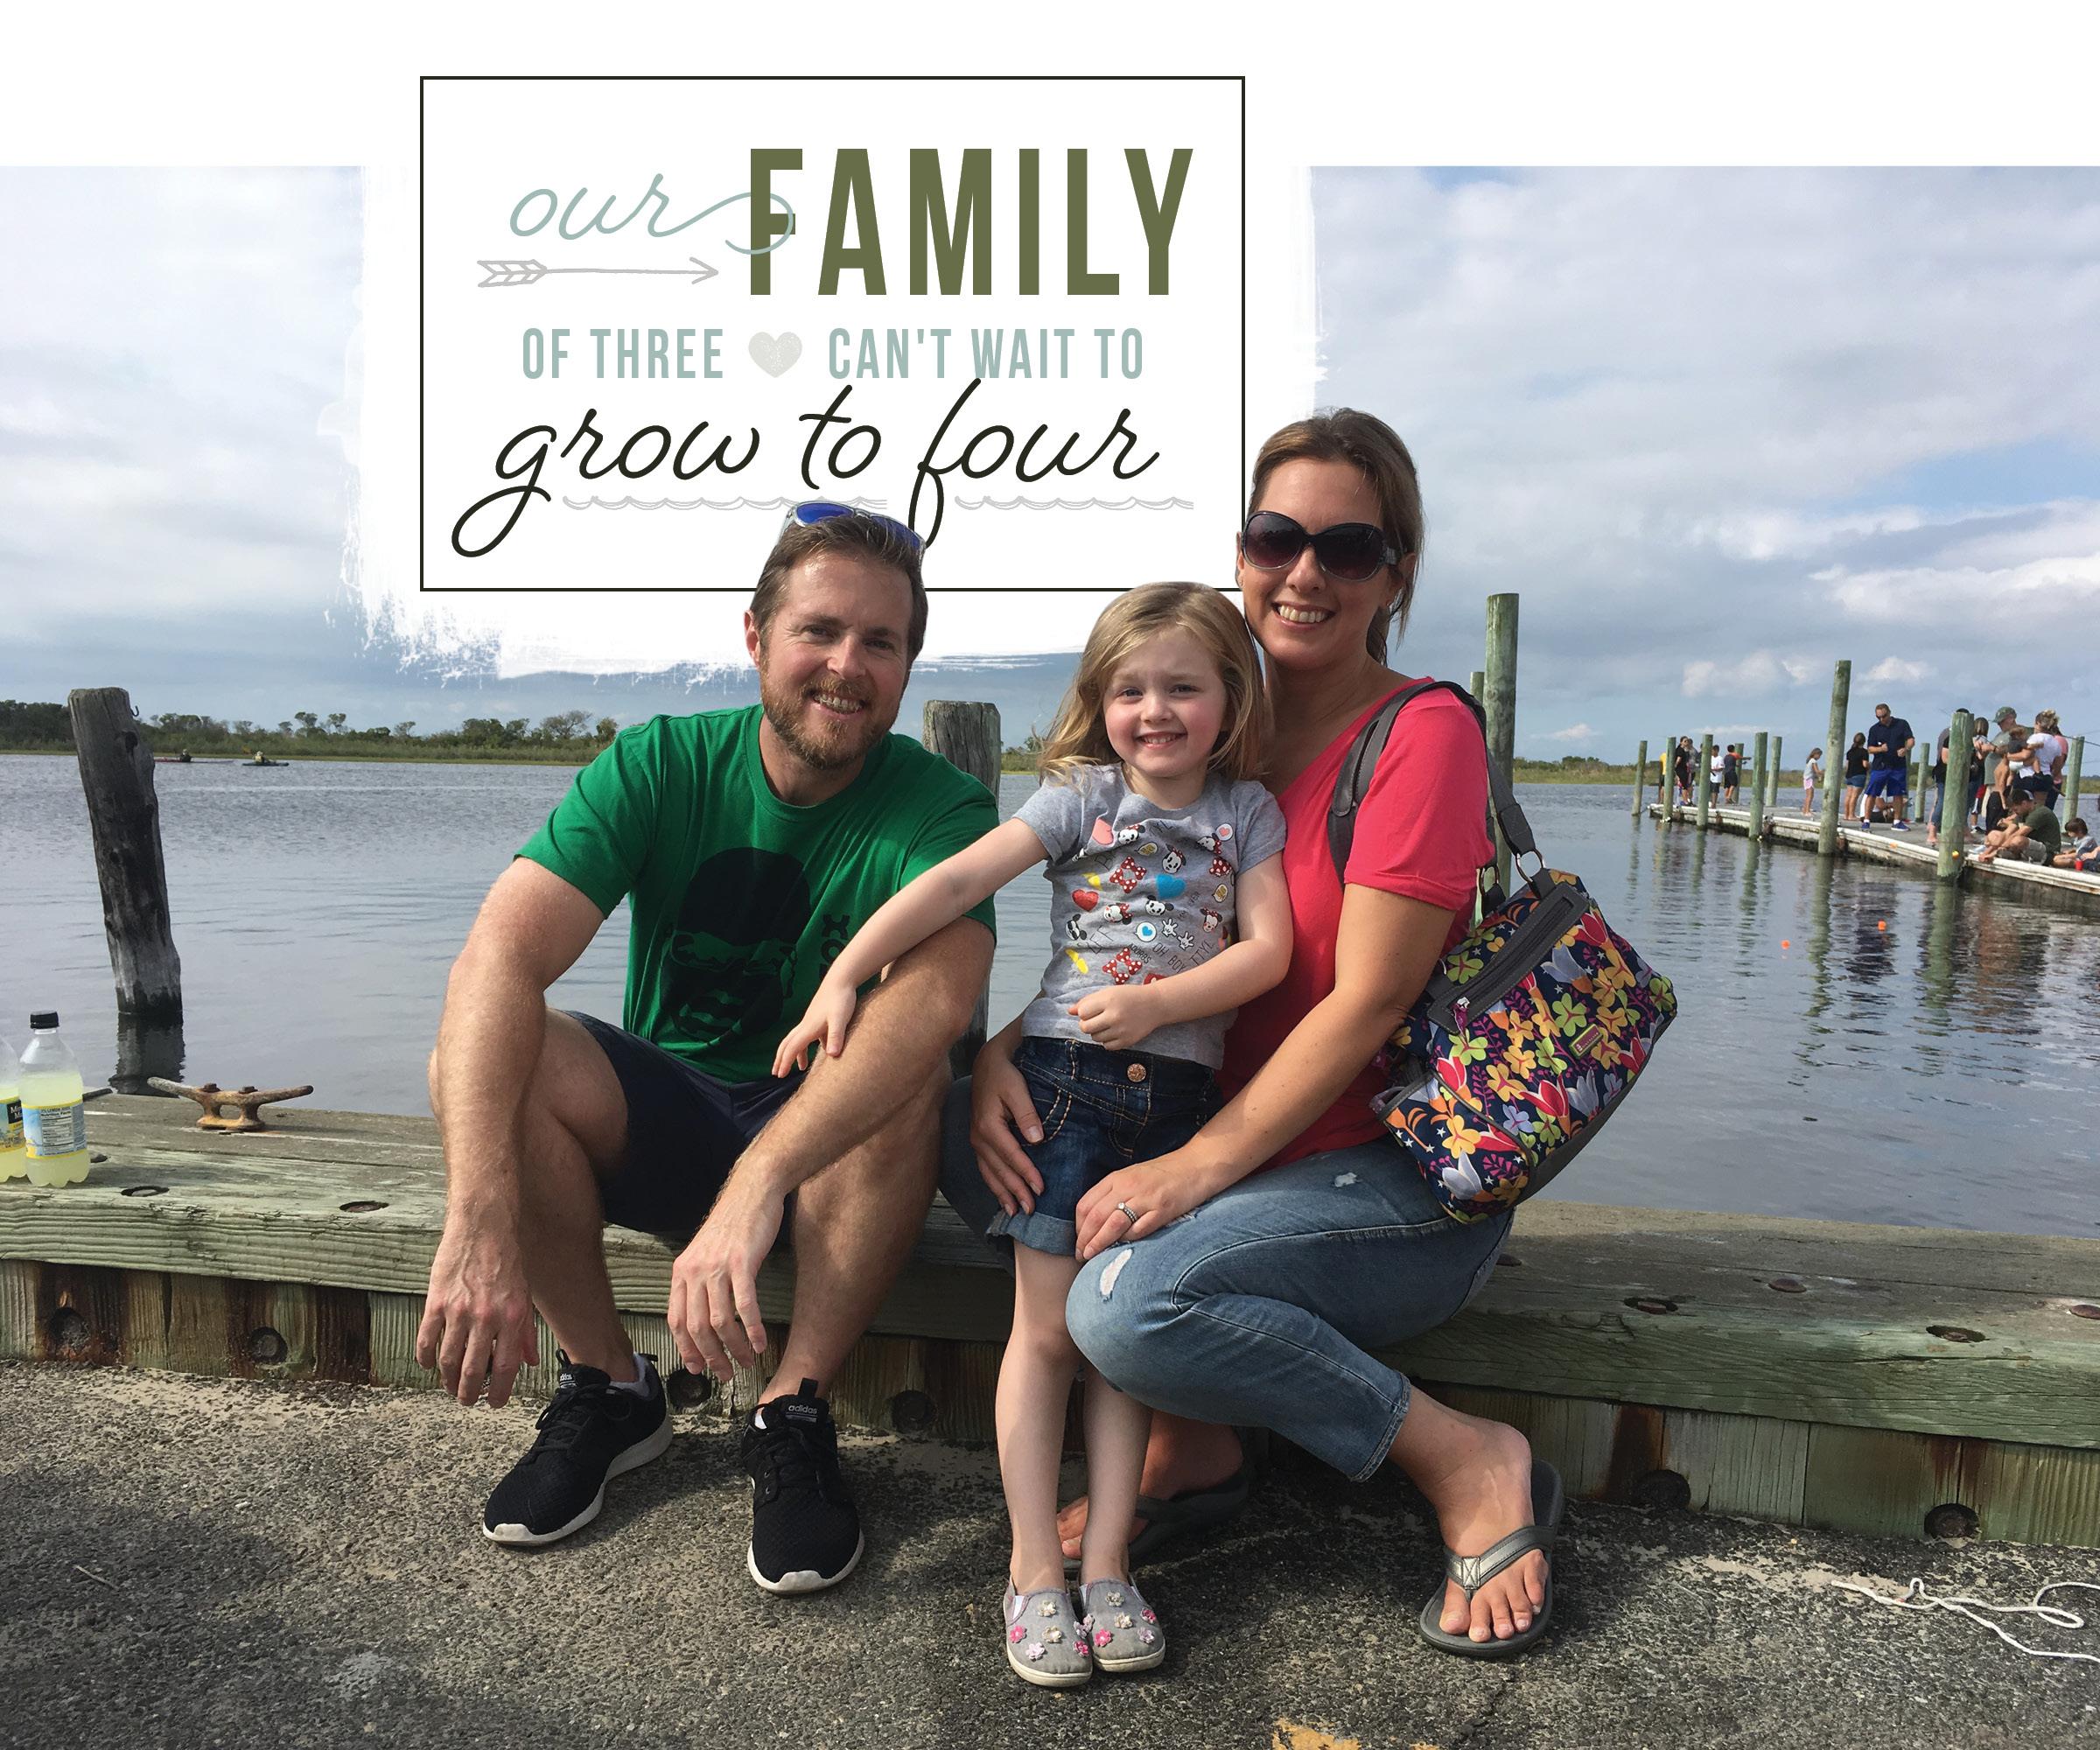 Family of three can't wait to grow through adoption